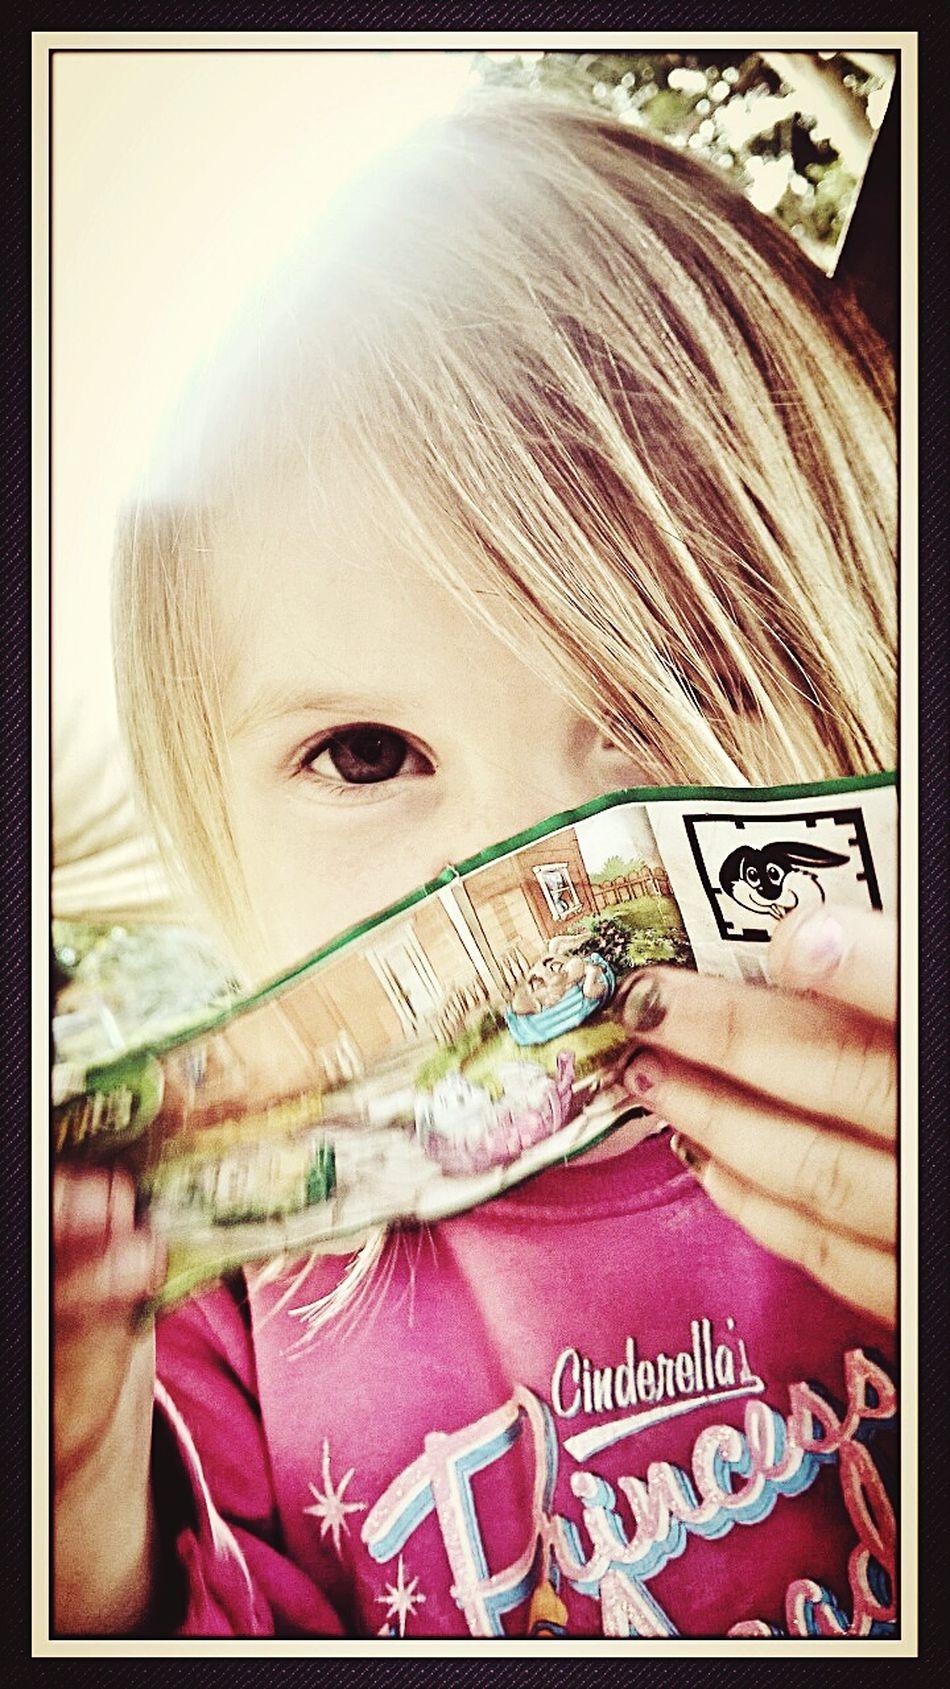 The Portraitist - 2016 EyeEm Awards Enjoying Life Hanging Out Showcase May Brisbane Australia Brisbanestyle Australian Photographers Queenslandaustralia Taking Photos Freelance Life Check This Out Eyeems Family Unconditional Love Too Cute To Handle Cheese! Girls Just Wanna Have Fun :) GirlsGeneration Neighbourhood Kids Girl Power The Essence Of Summer- 2016 EyeEm Awards Innocenceofachild Innocence Of Youth Innocent Eyes Innocent Faces